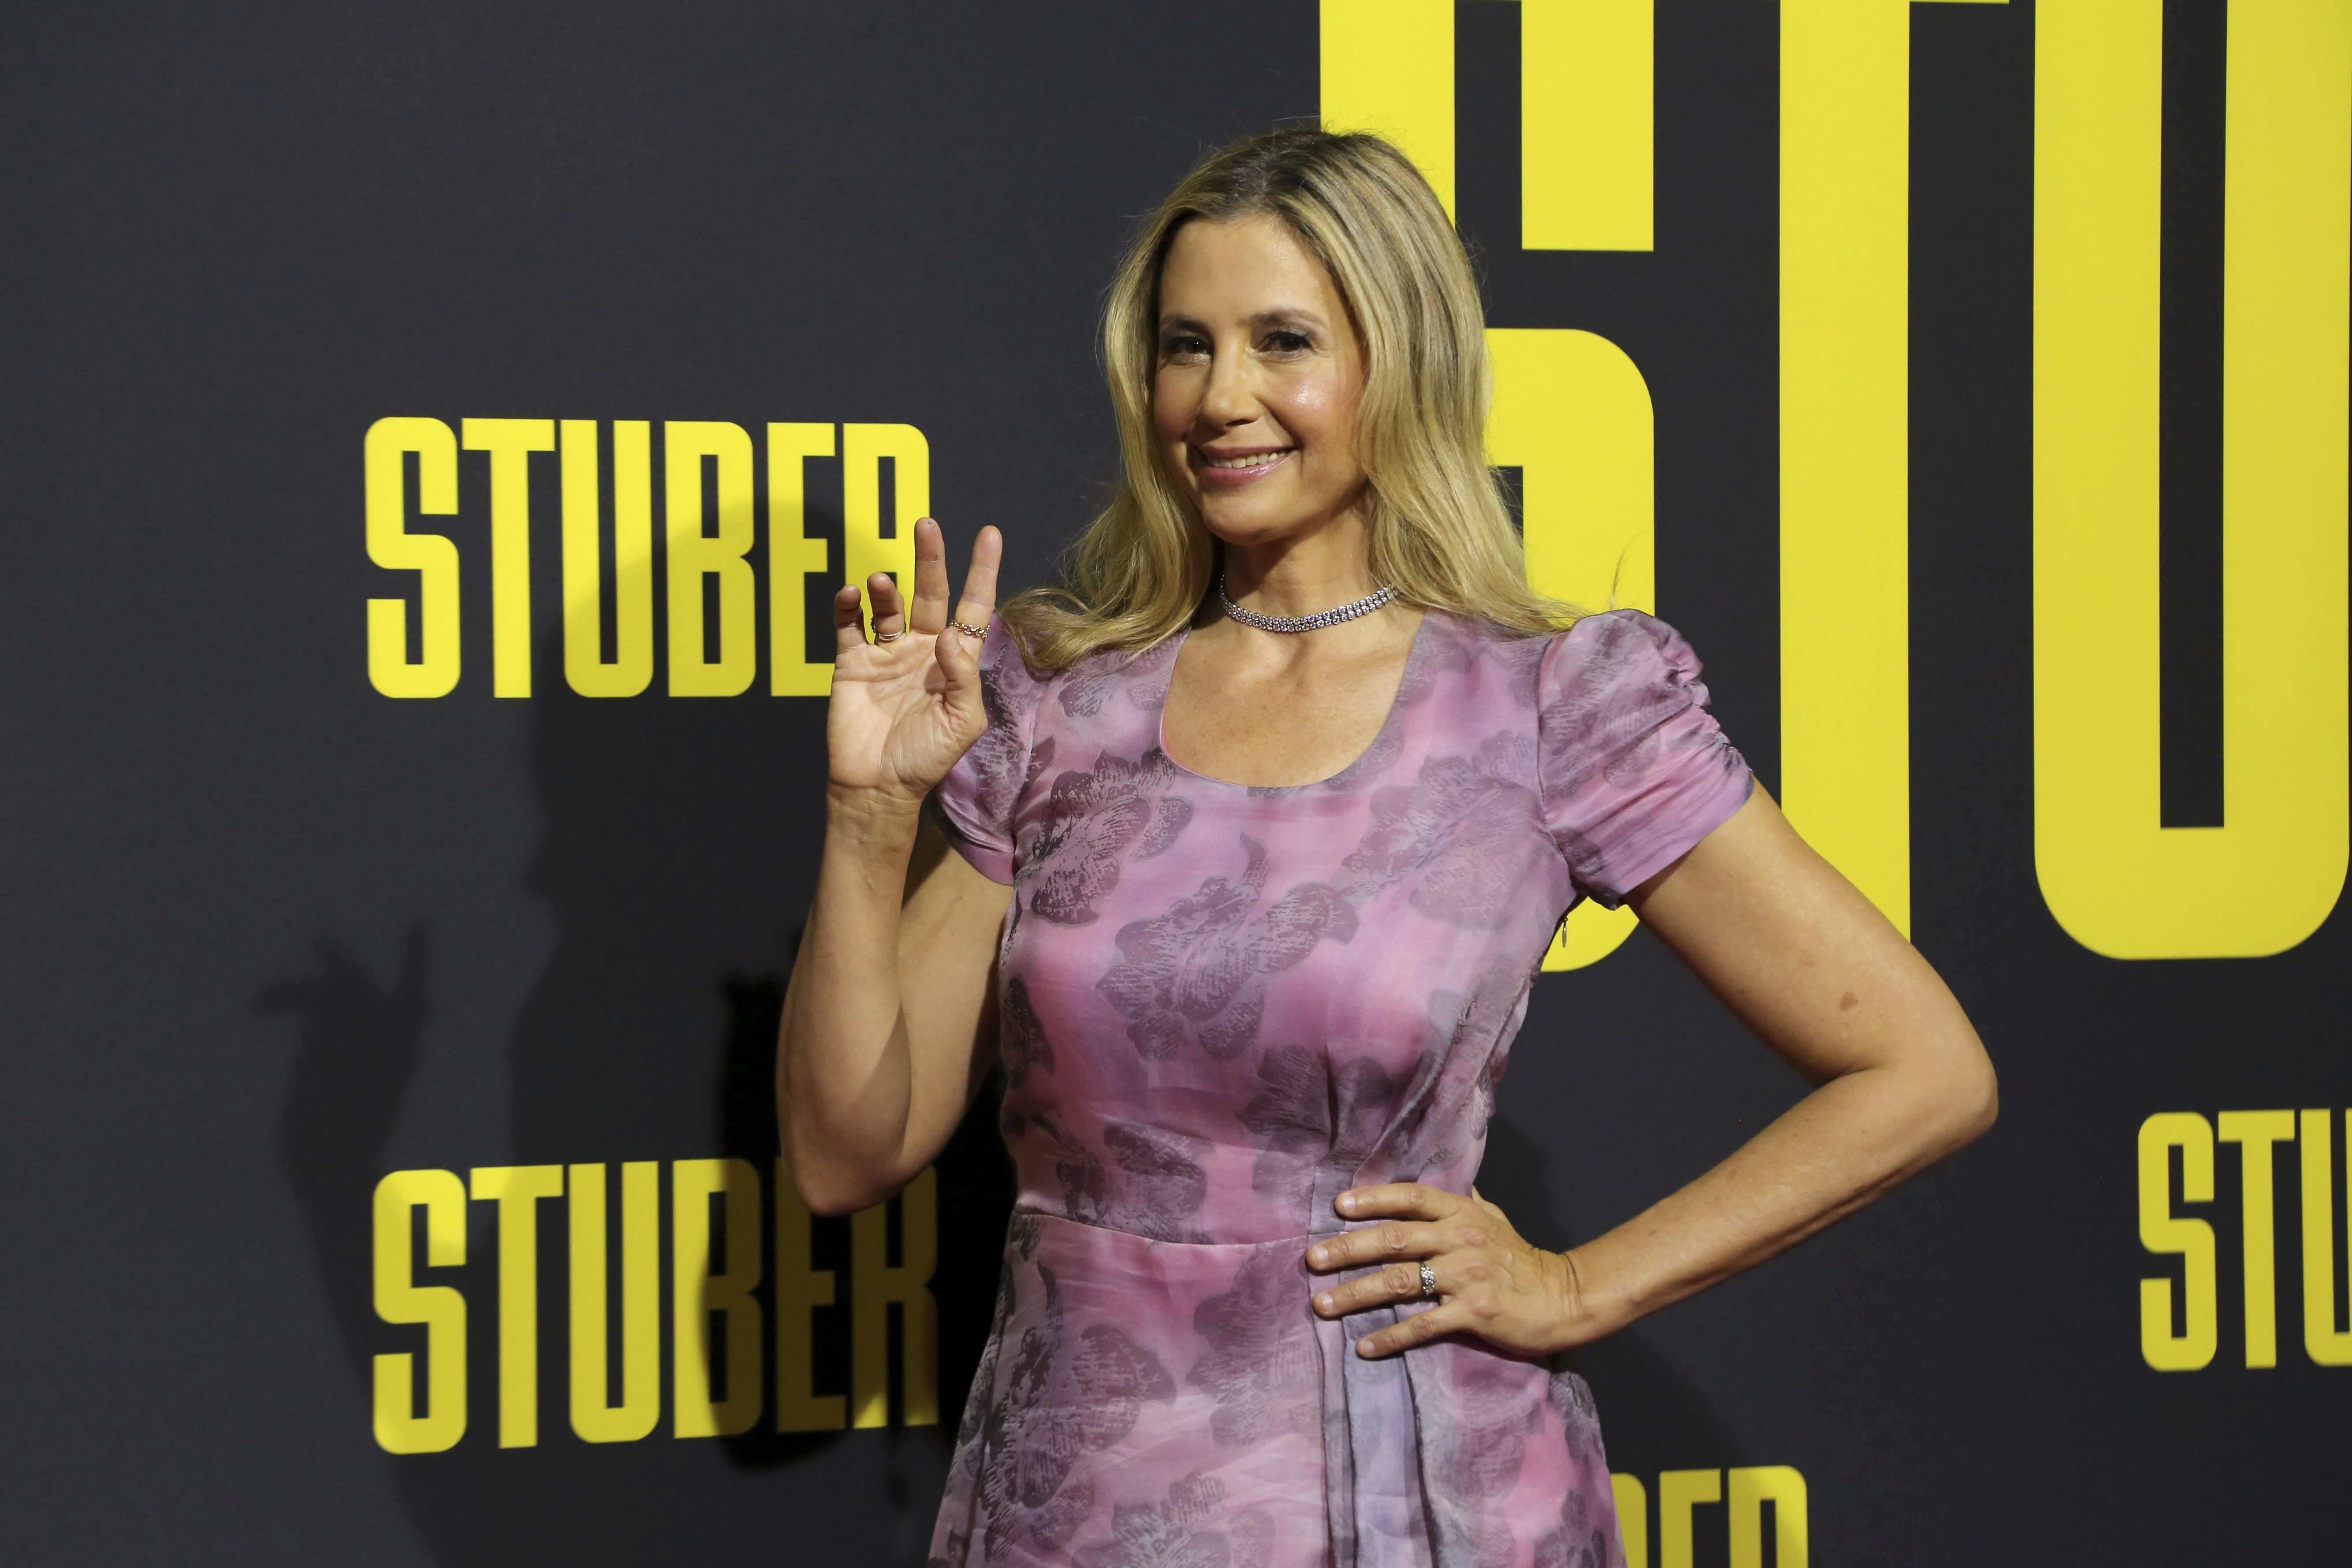 Stuber's' Mina Sorvino has a 'pathetic' Uber rating (says